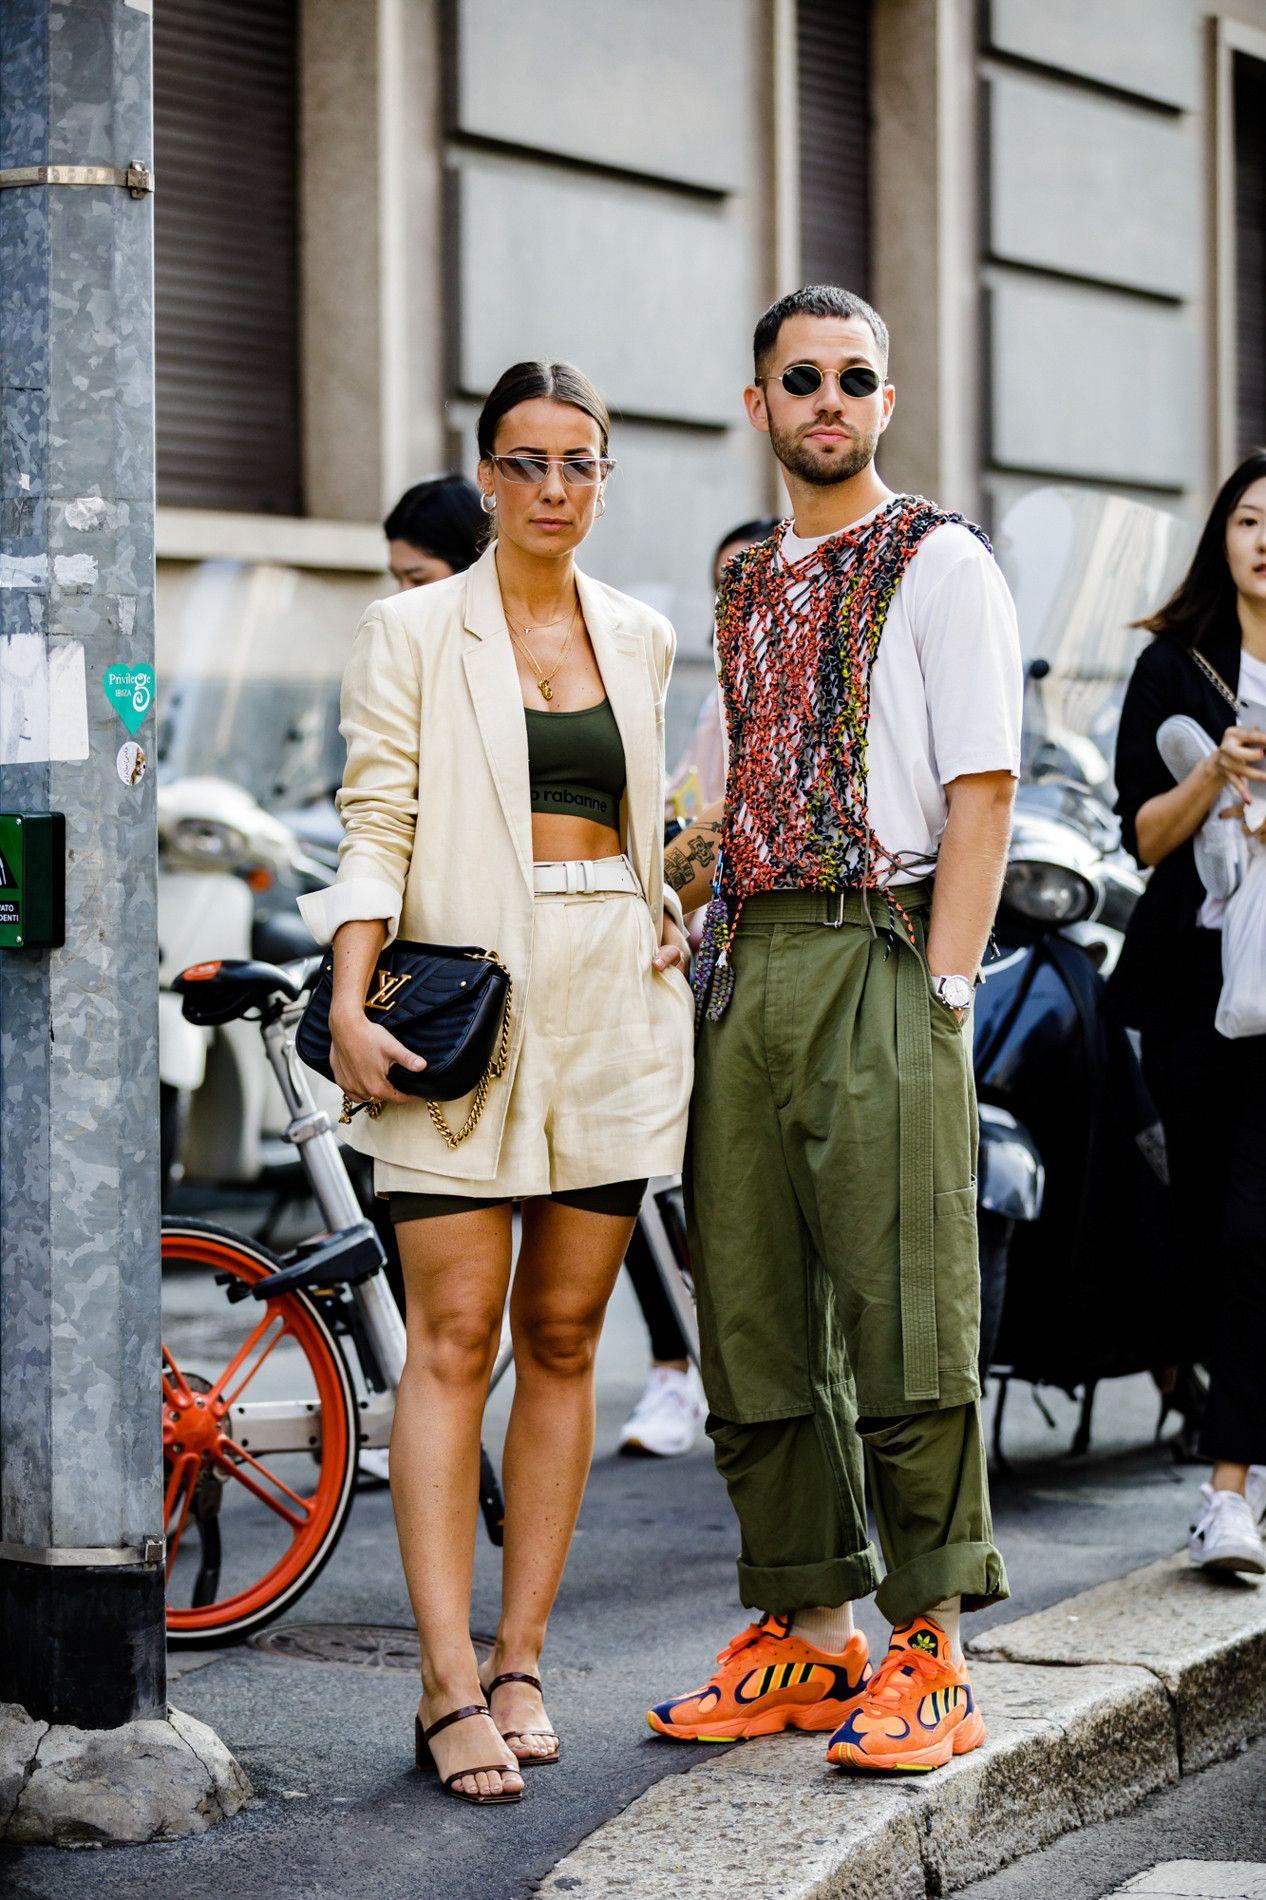 ec022af6f607 Milan Fashion Week Spring Summer 2019 Street Style ss19 streetwear sneakers